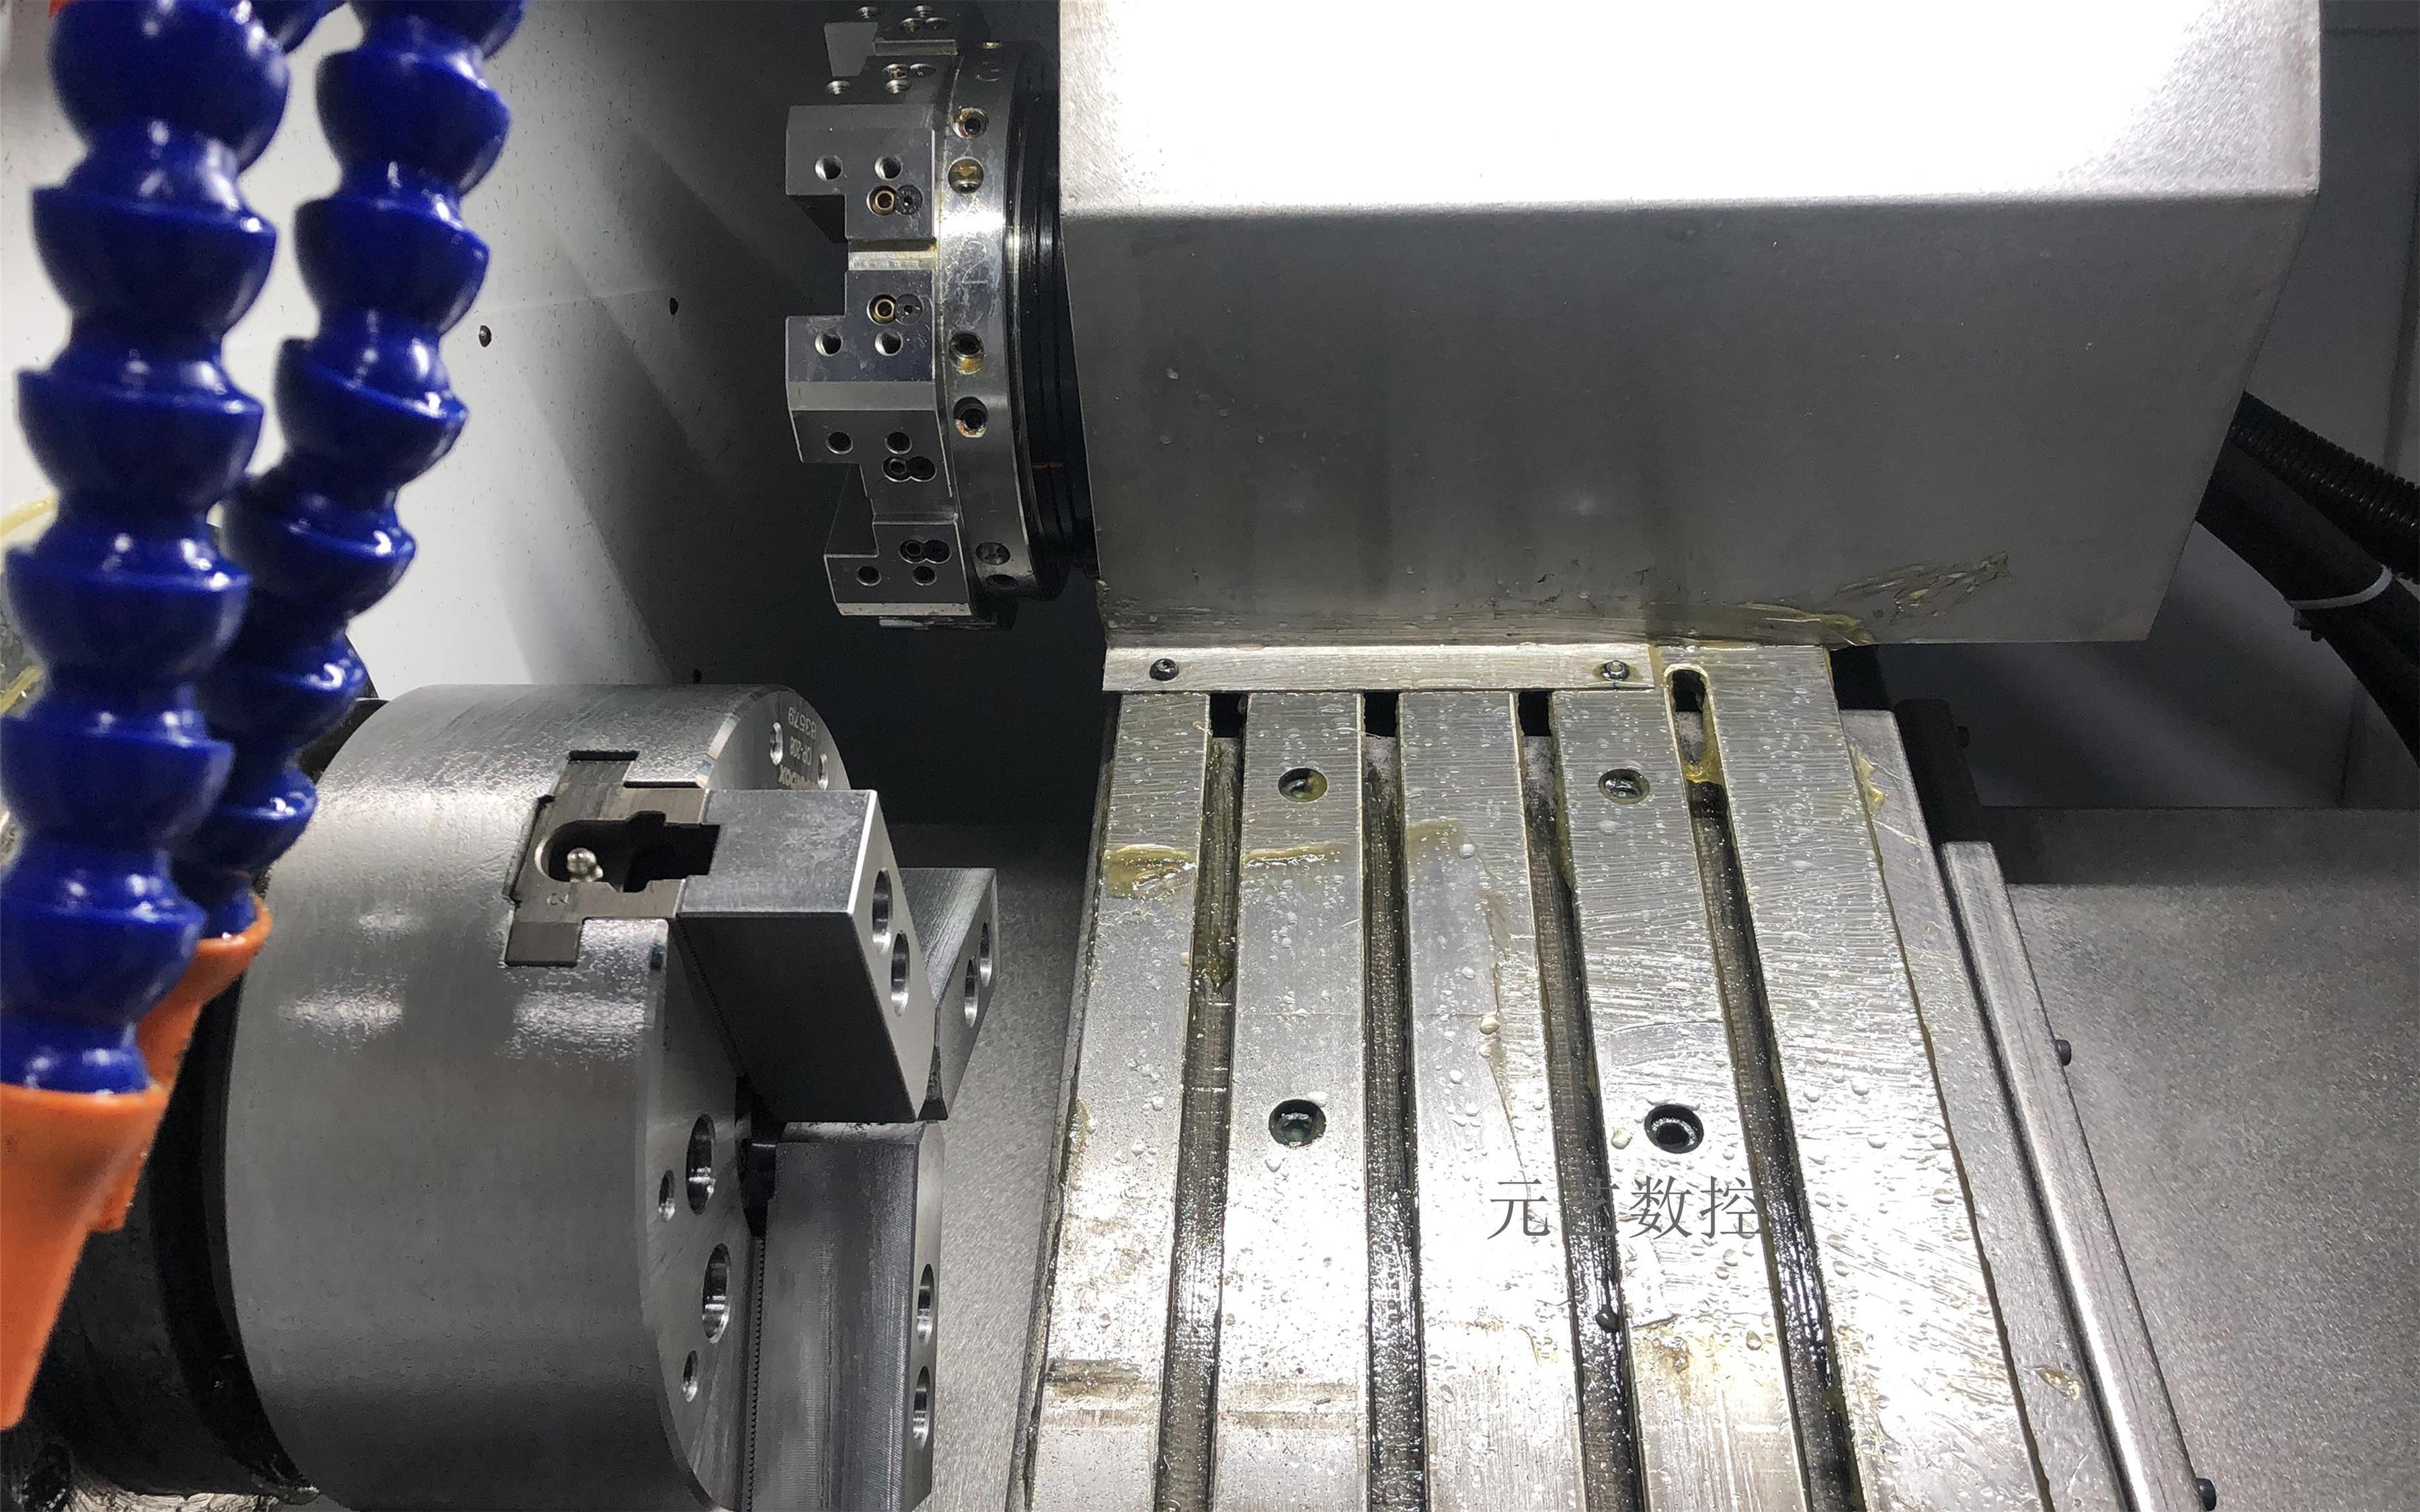 CK52X/D 刀塔斜轨精密数控车床(不带尾顶)